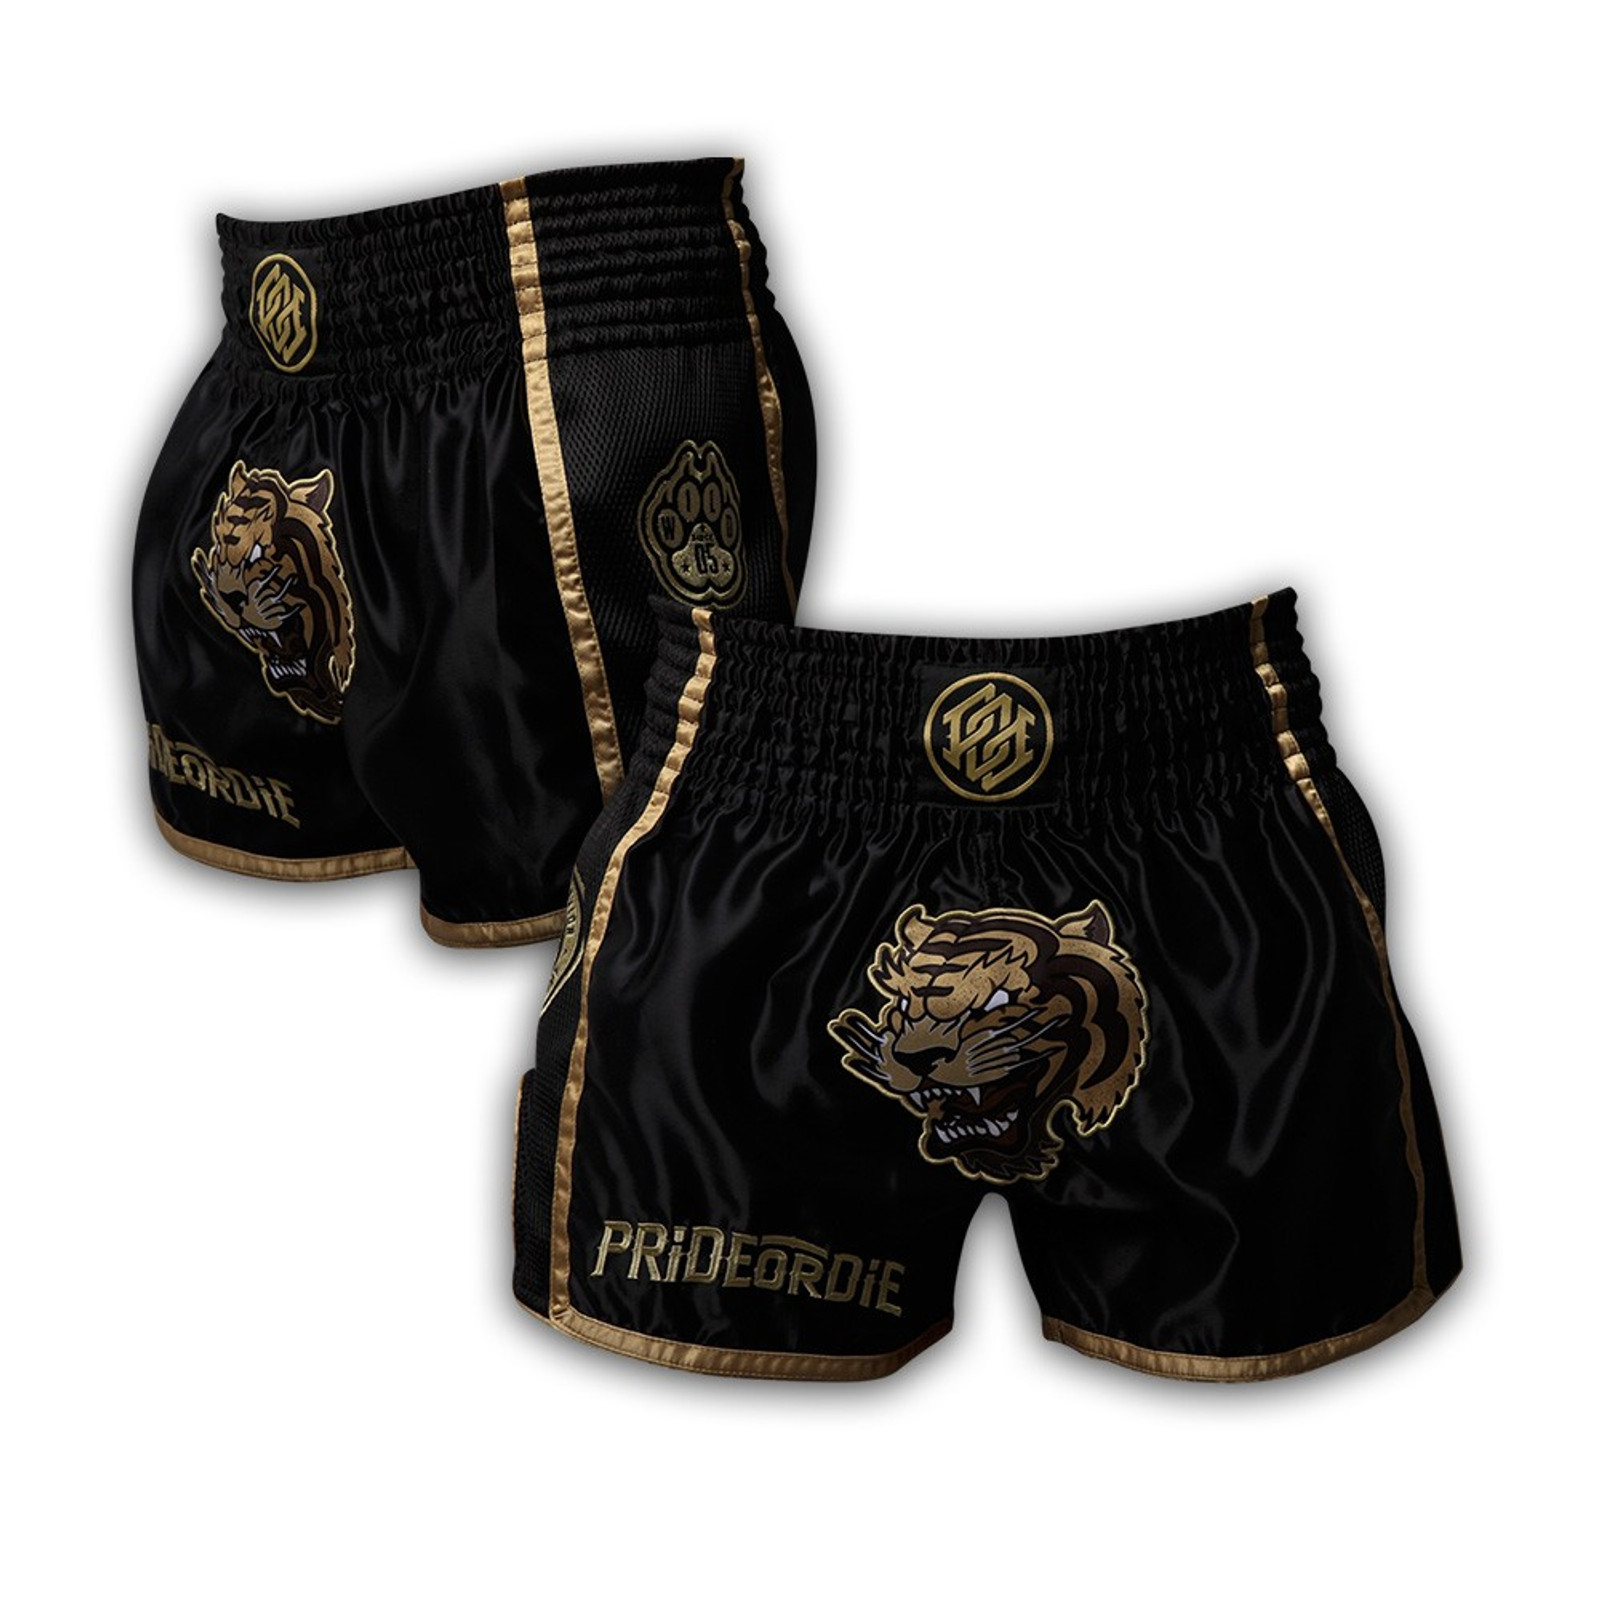 Pride Or Die Muay Thai Shorts Unleashed in Schwarz